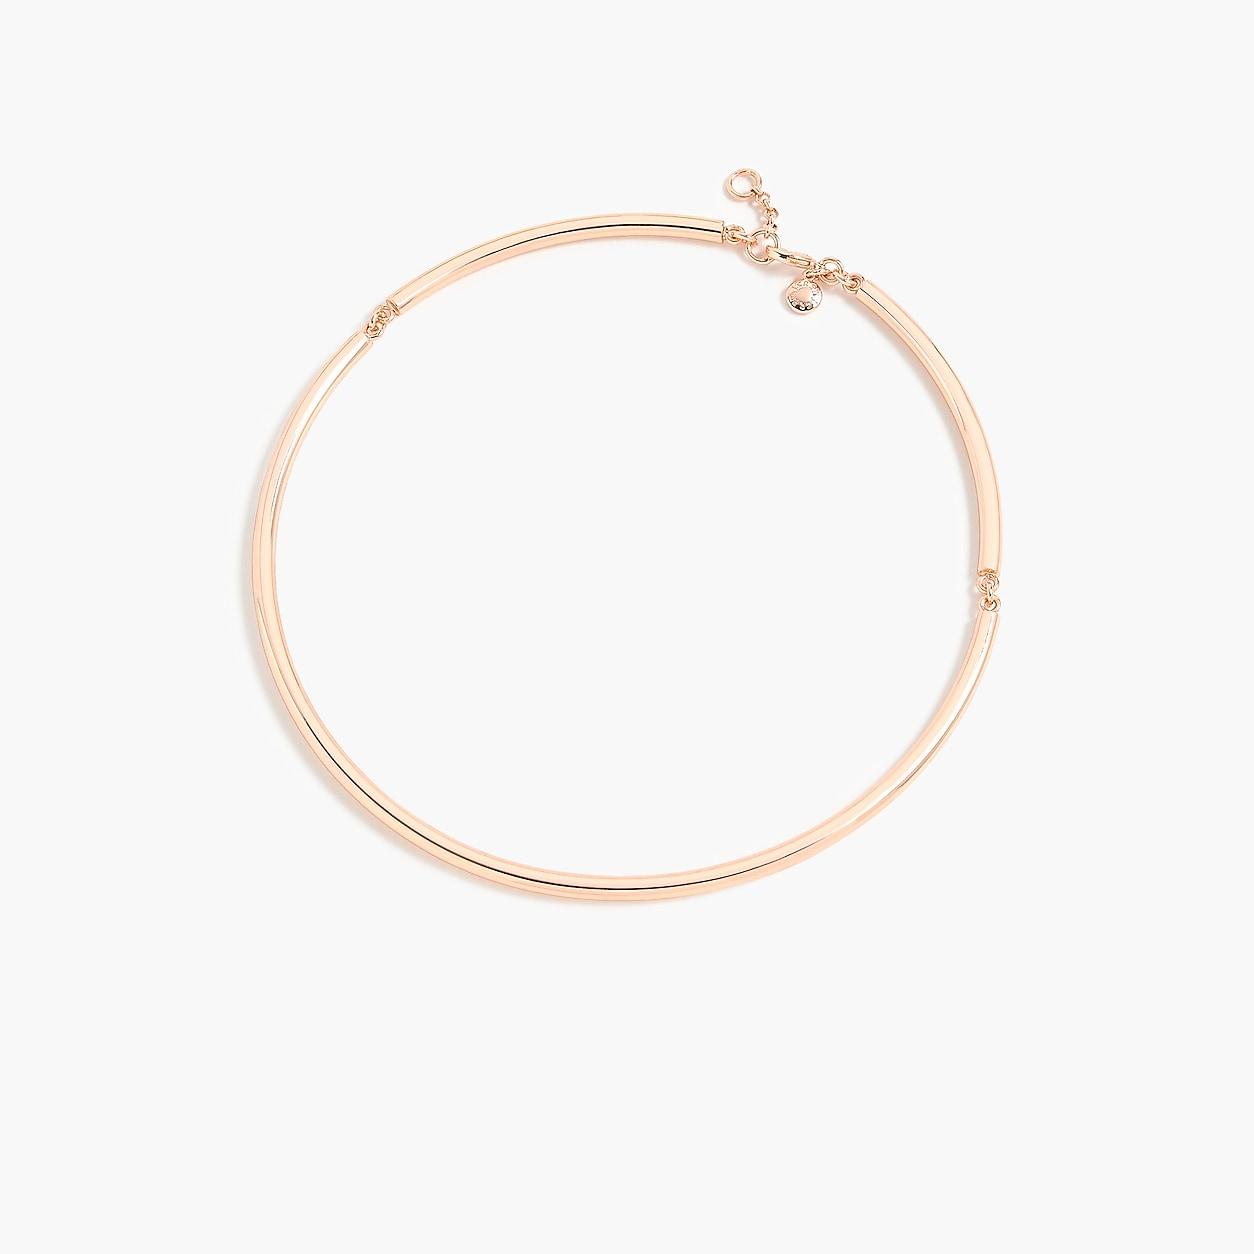 Simple collar necklace | J.Crew US